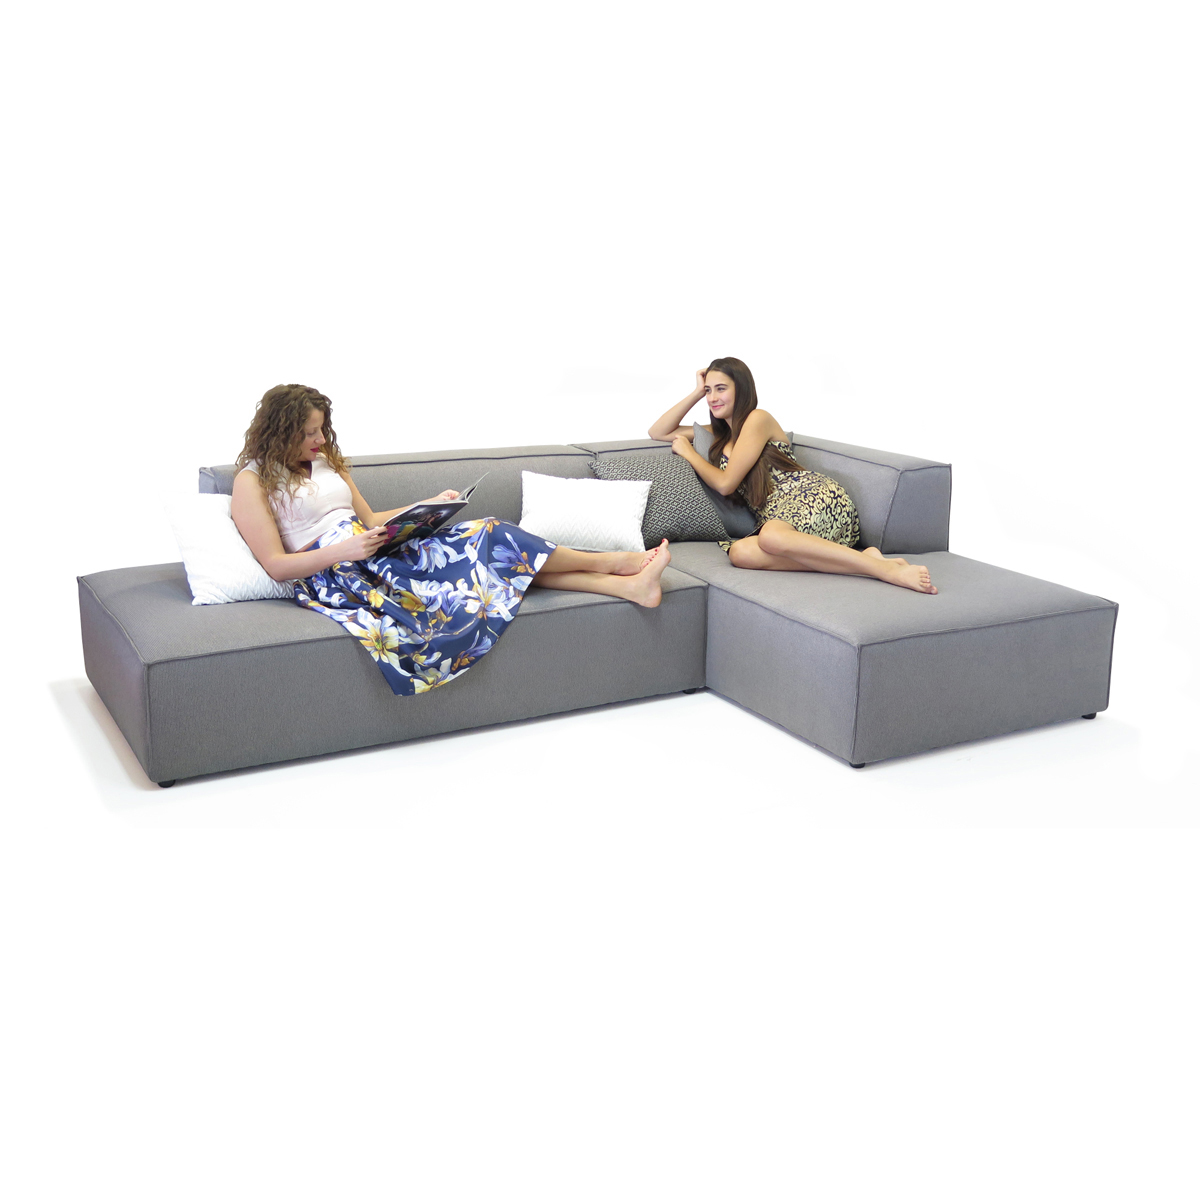 manhattan designer wohnlandschaft exklusiv nur bei moebel trend 24 online kaufen moebel trend 24. Black Bedroom Furniture Sets. Home Design Ideas